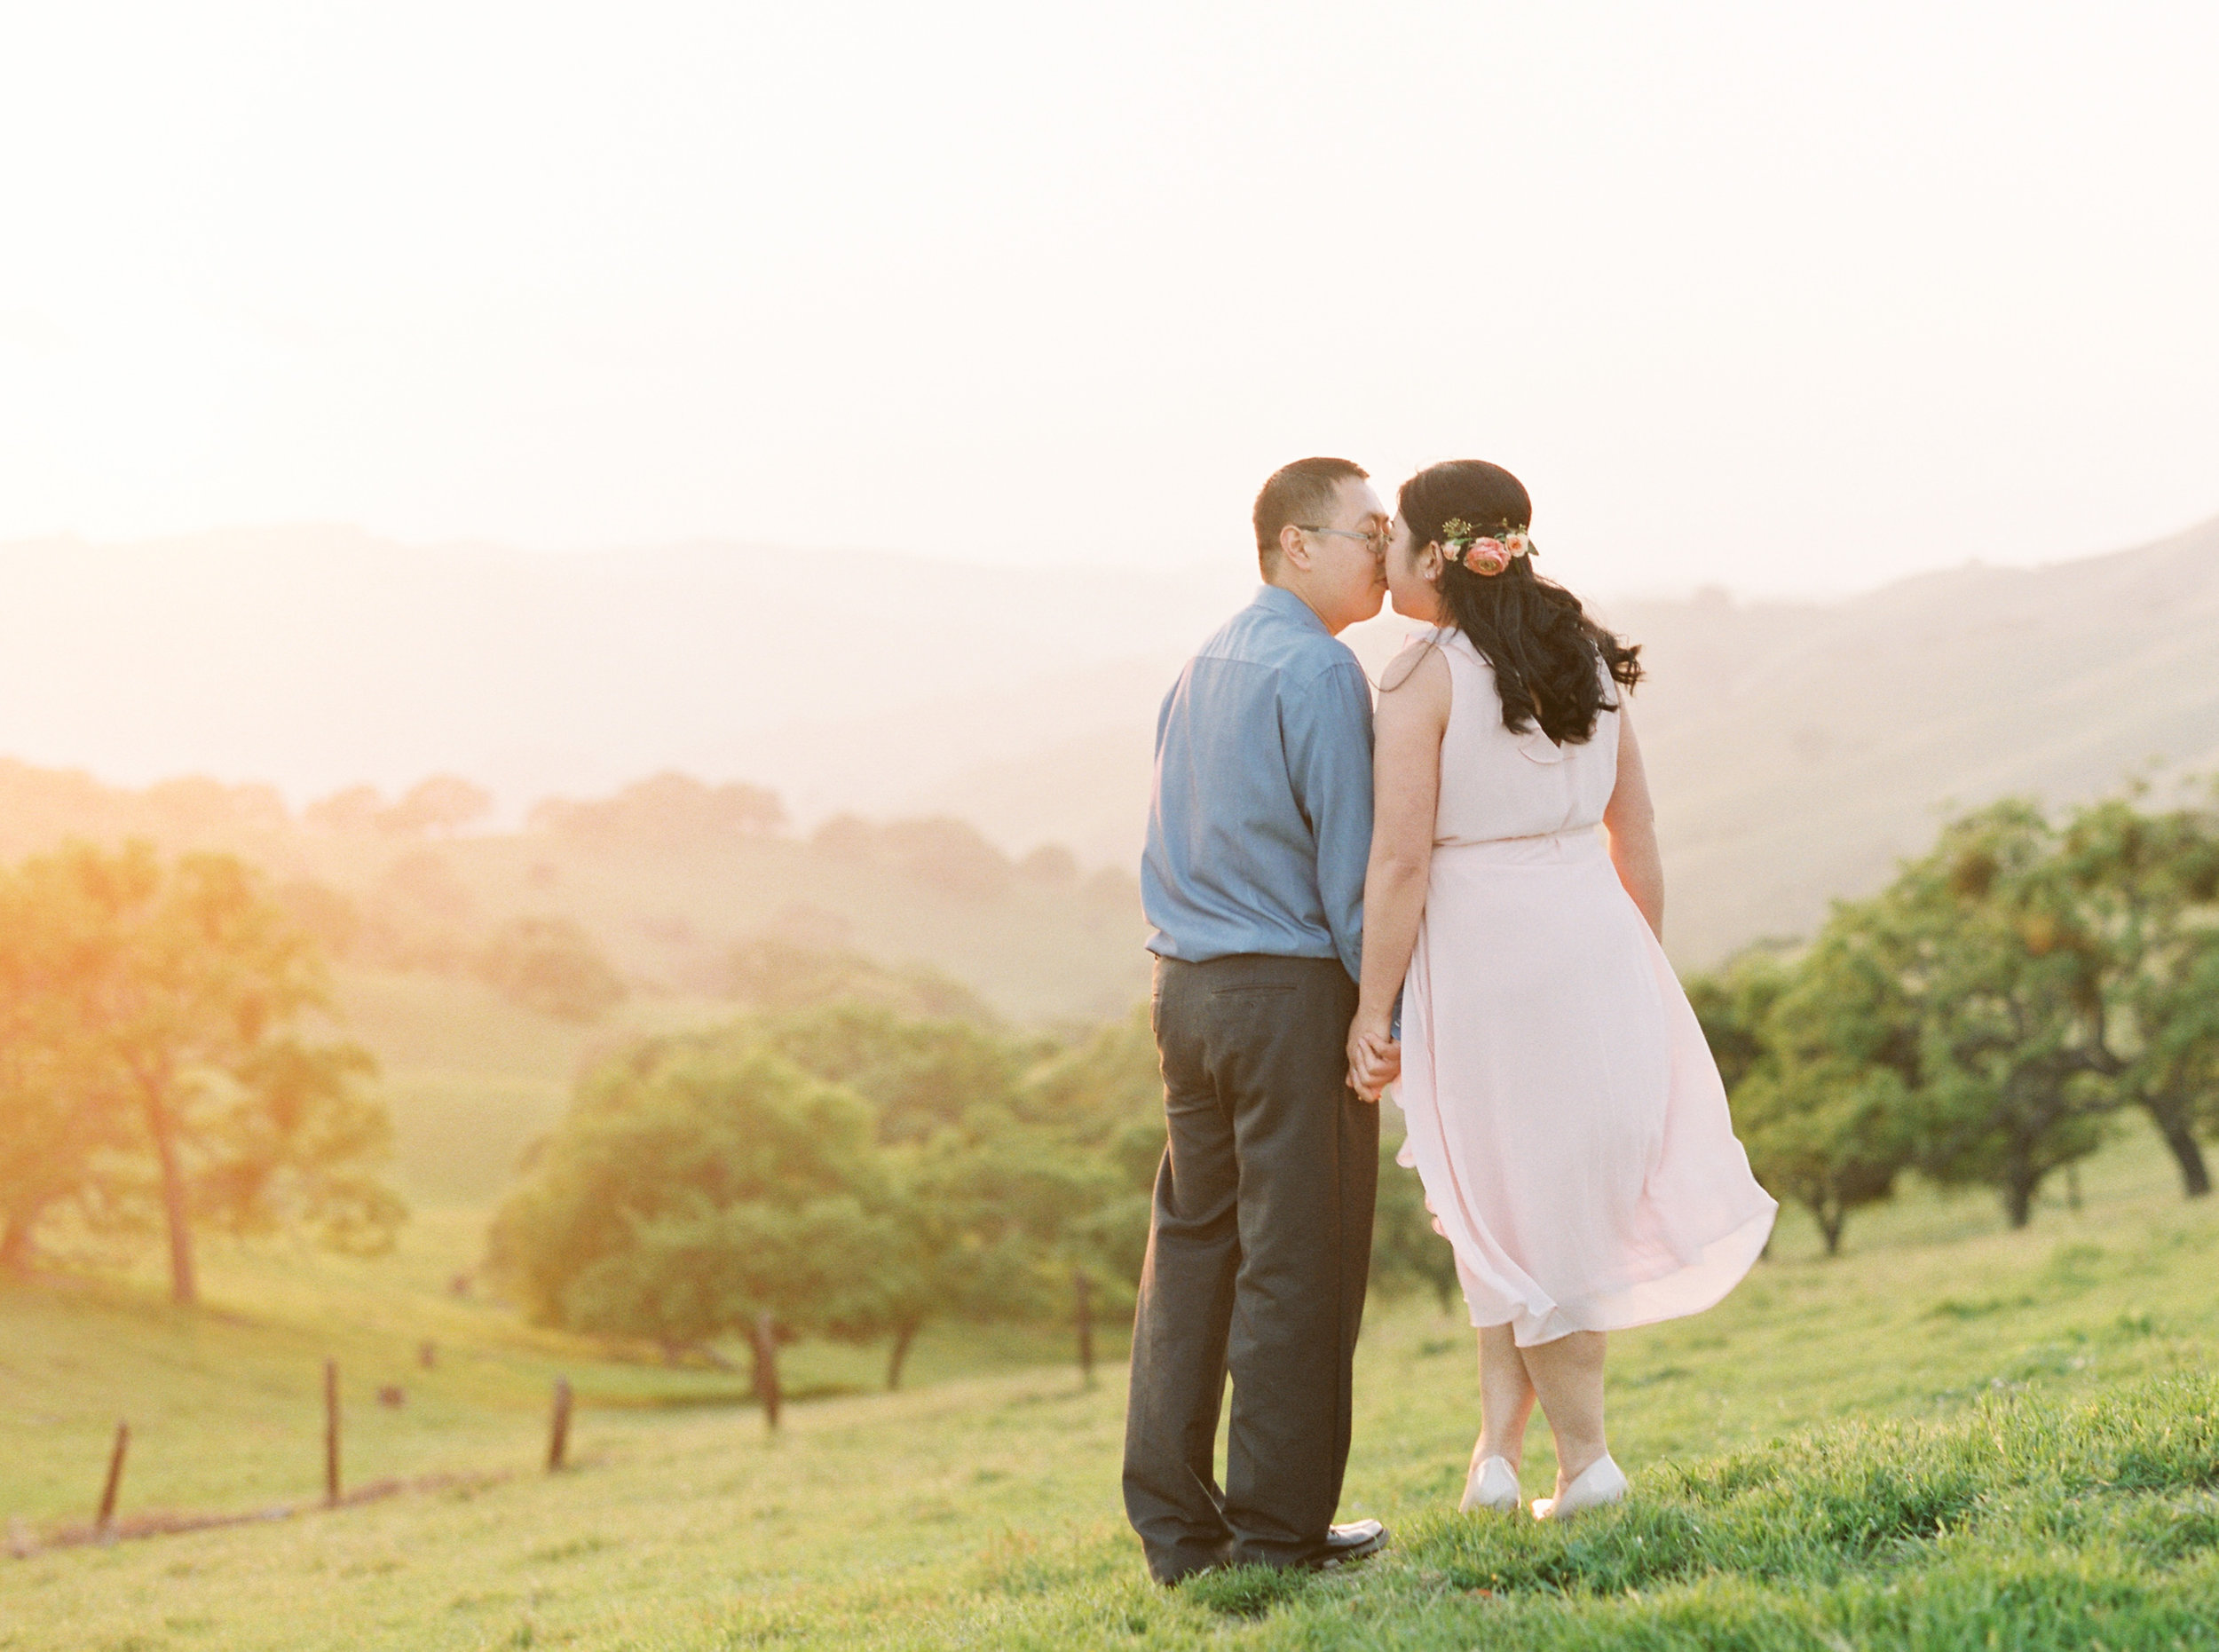 del-valle-livermore-bay-area-wedding-photographer-33.jpg